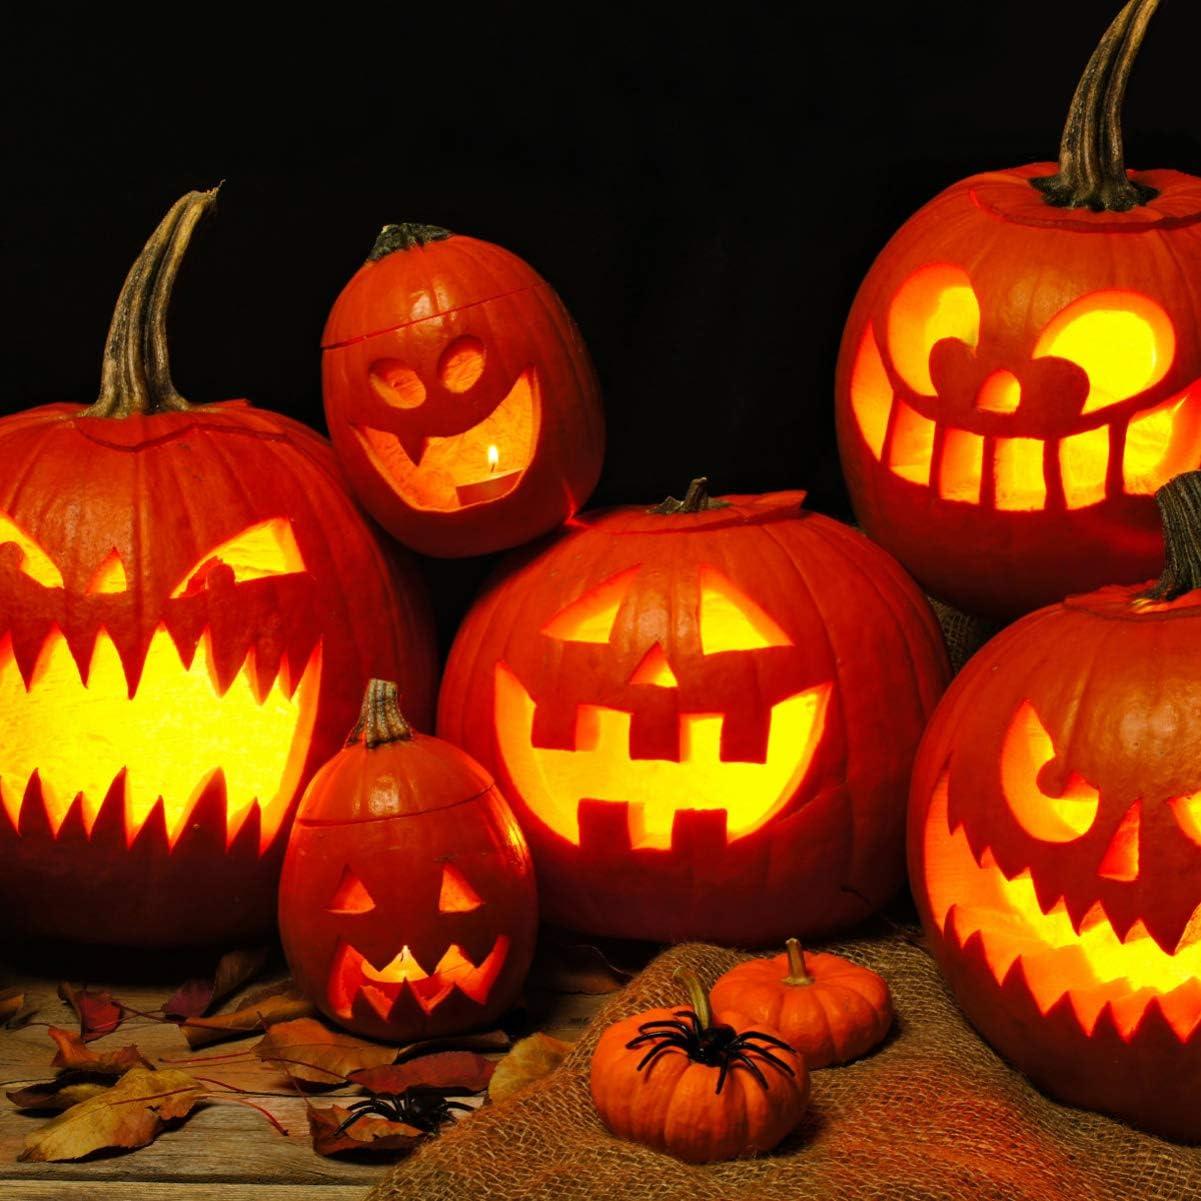 Halloween Pumpkin Carving Kit Stainless Steel Jack O Lantern Making Tools with 1PC Marker Pen 14PCS